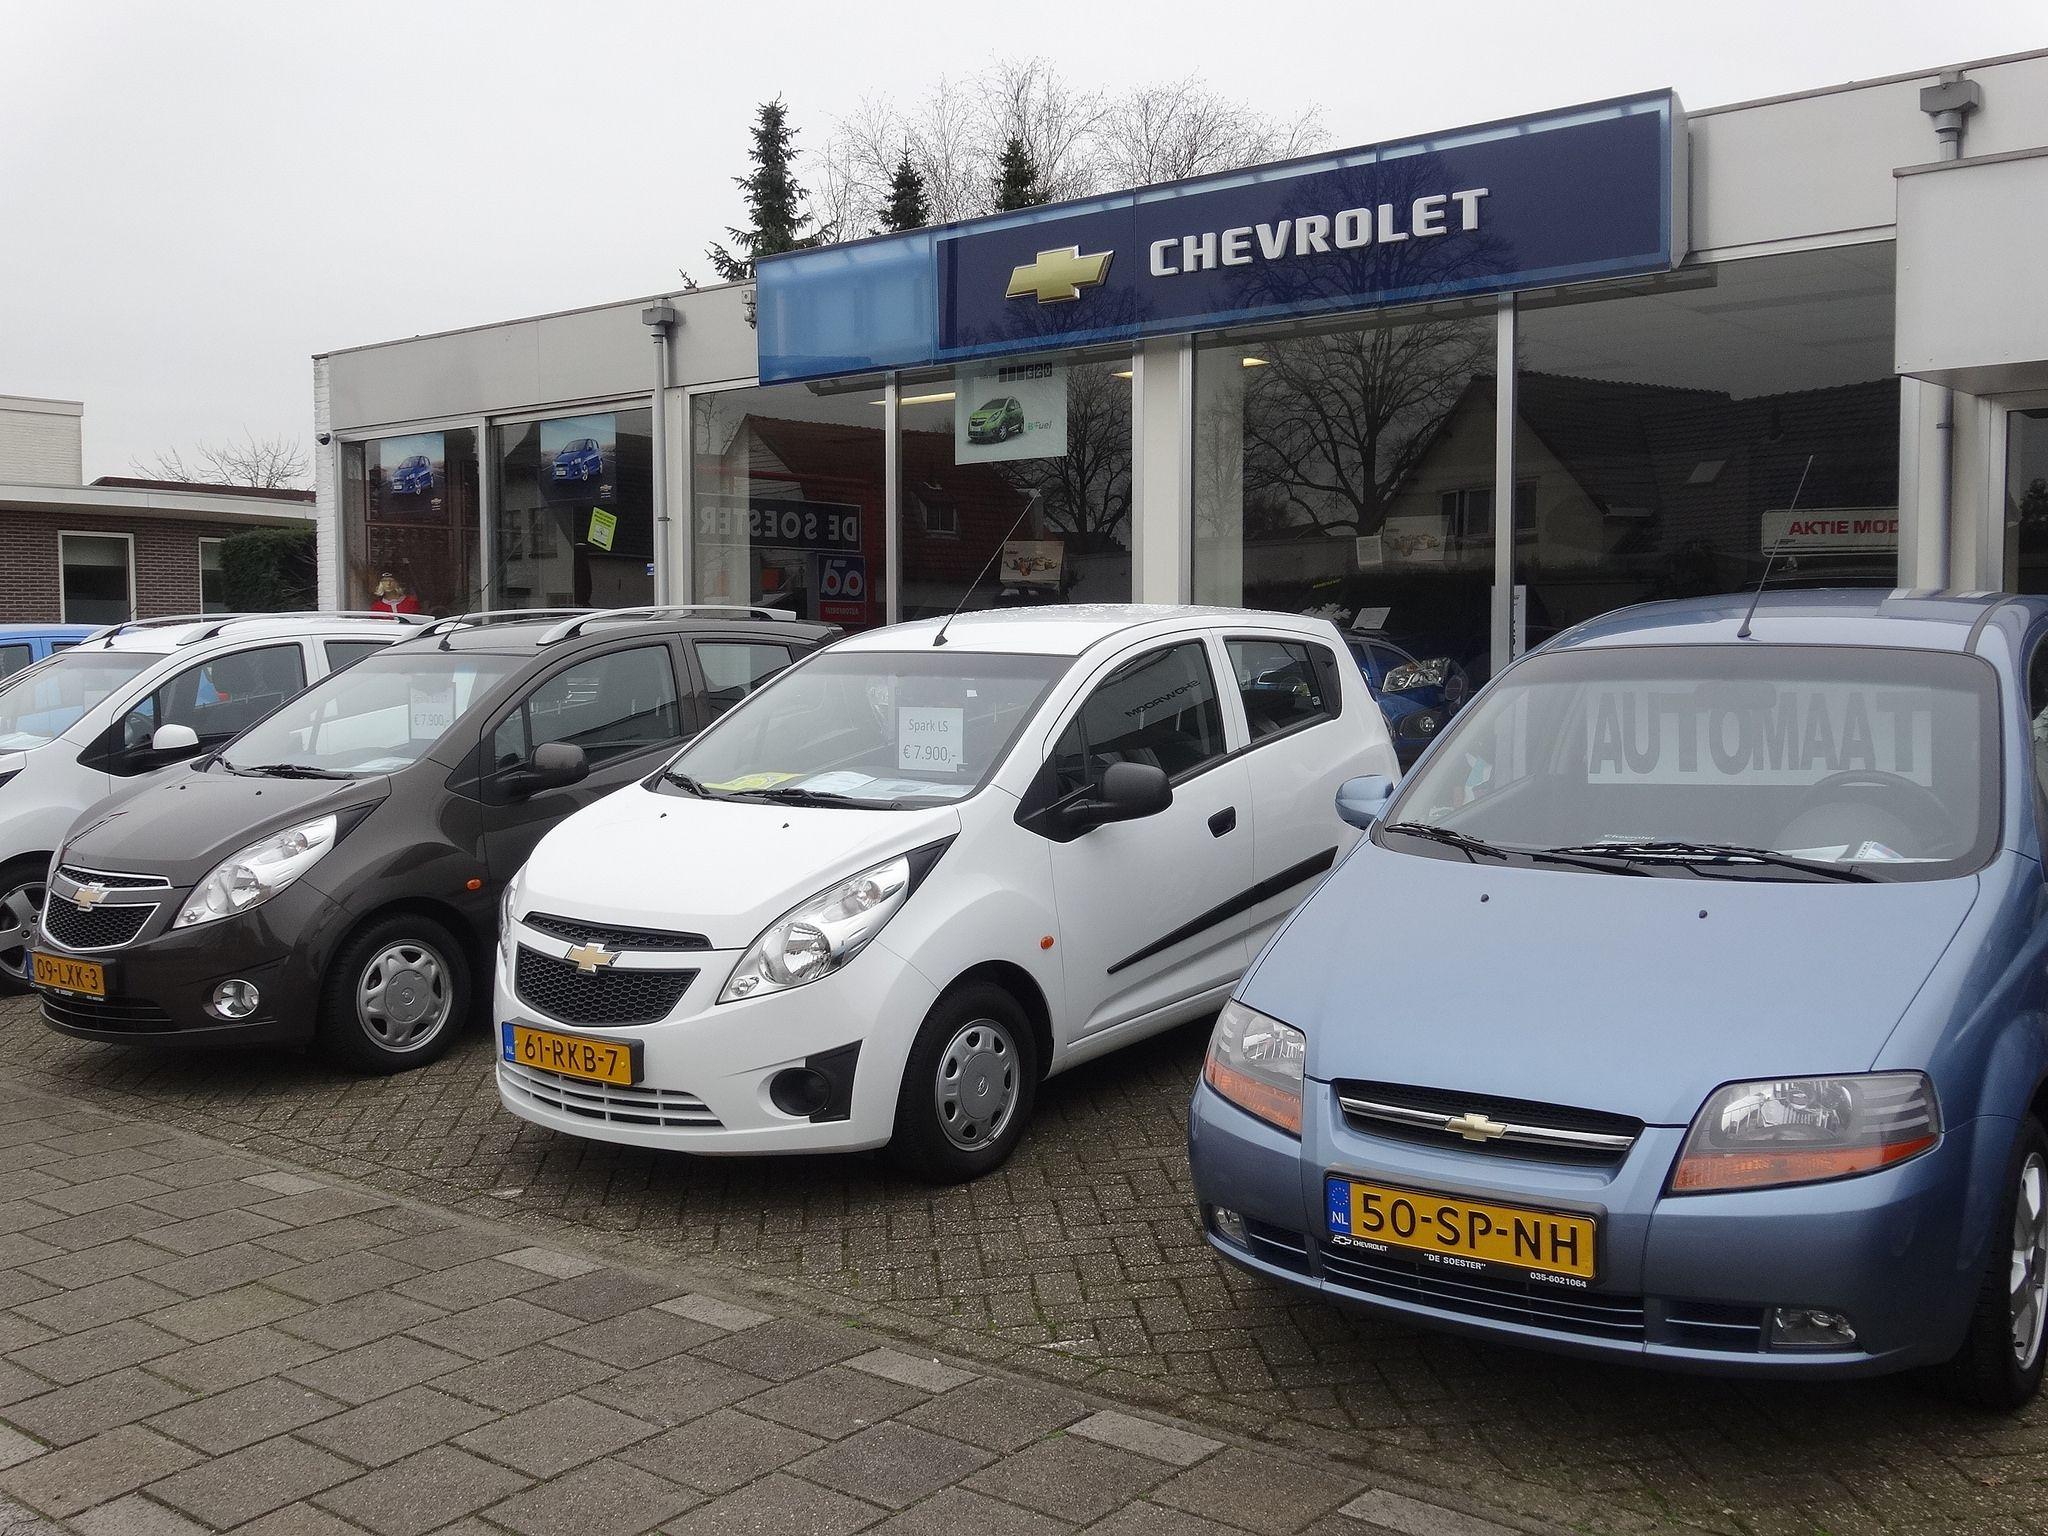 Soest De Soester Chevrolet Flic